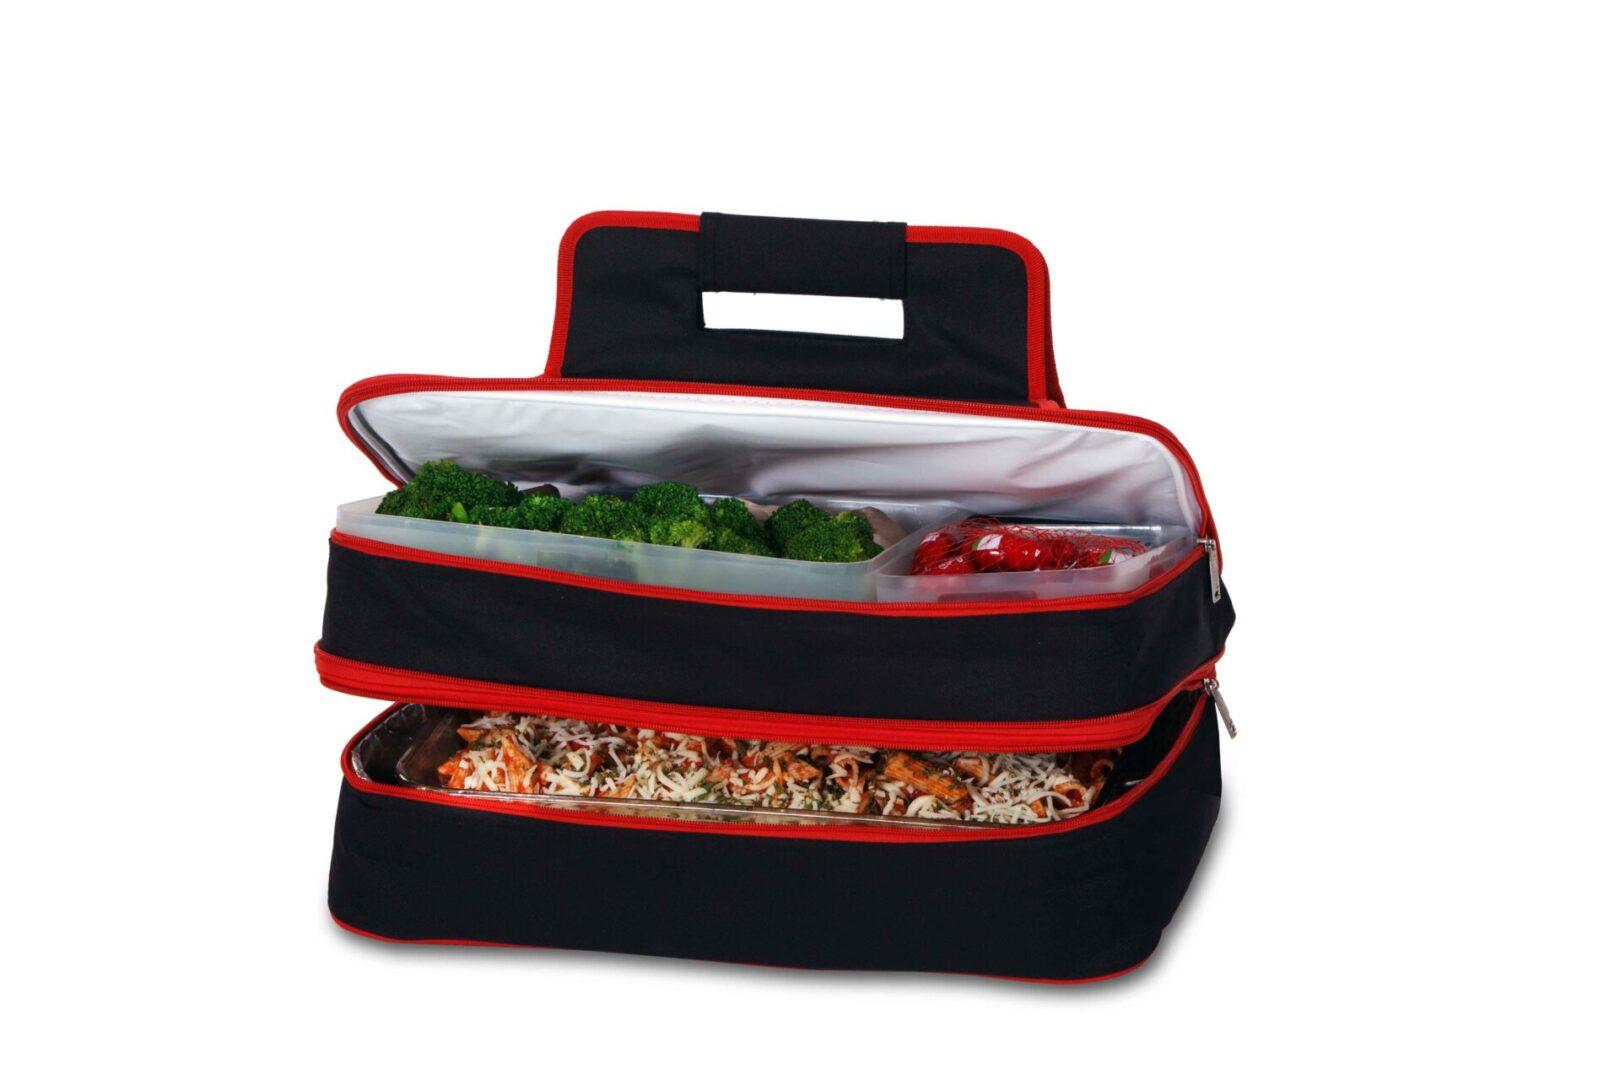 Entertainer Hot & Cold Food Carrier - Black/Red